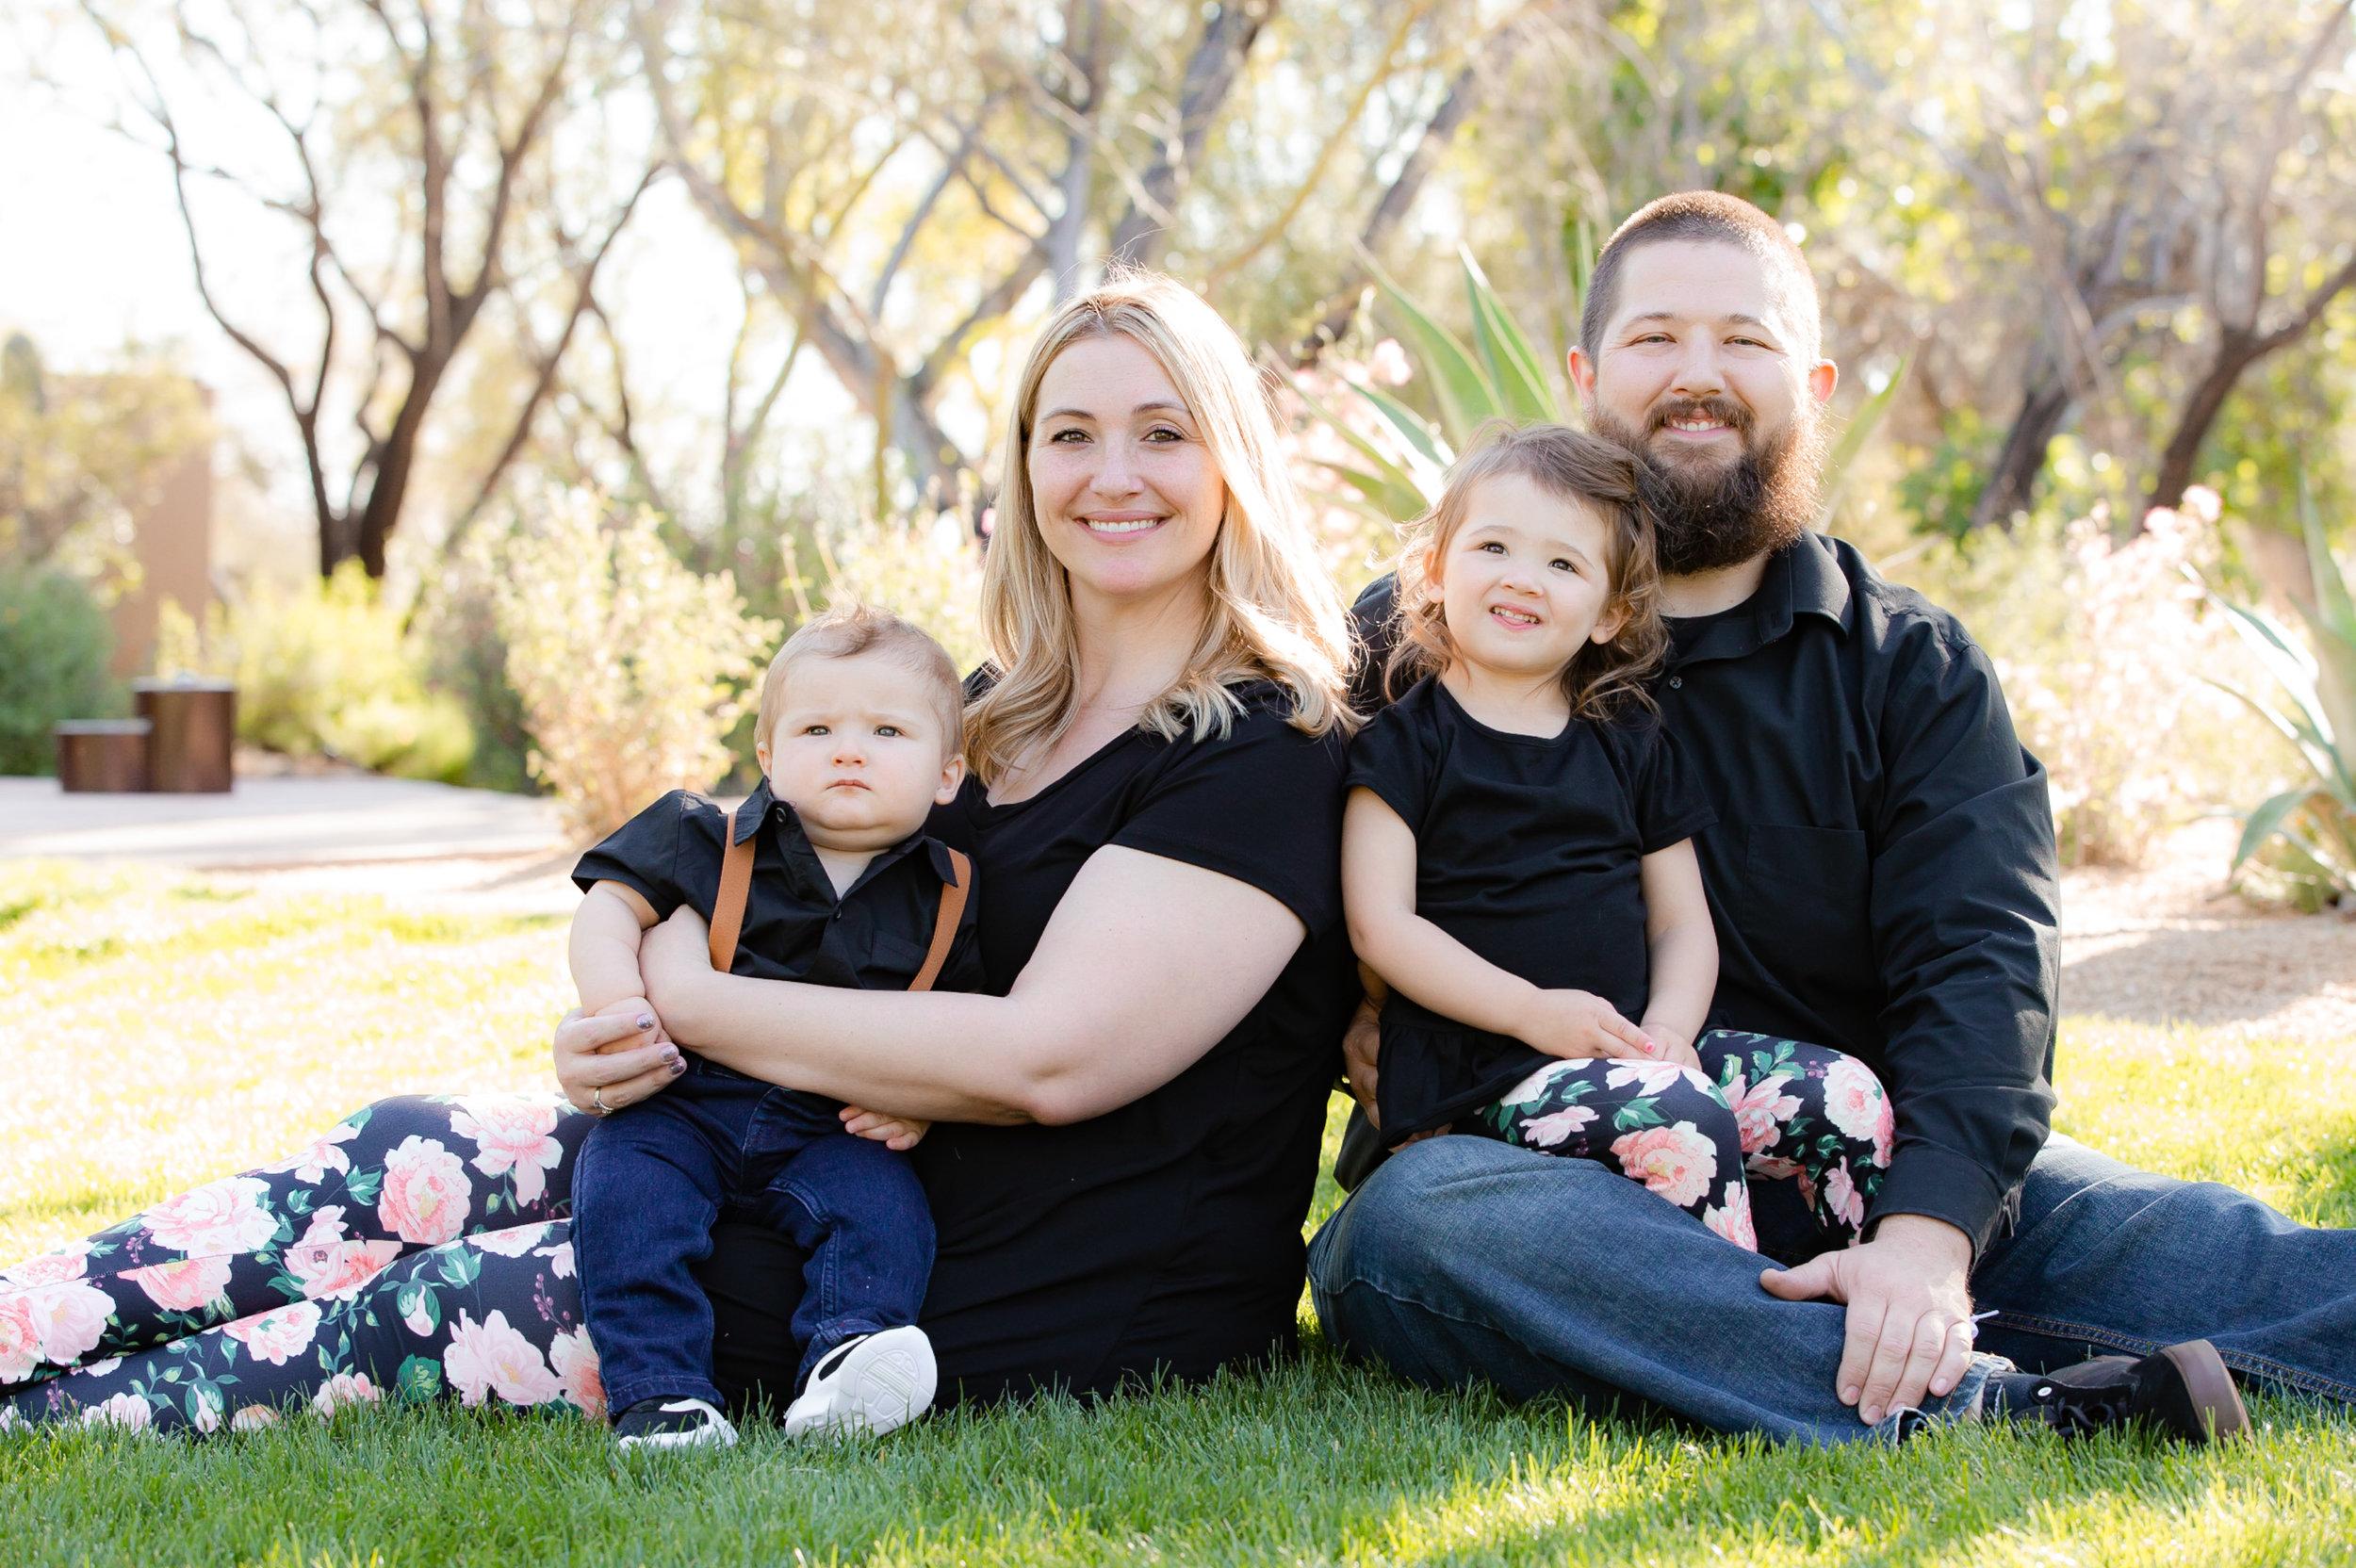 David-Orr-Photography_Family-Baby-Portraits-web.jpg